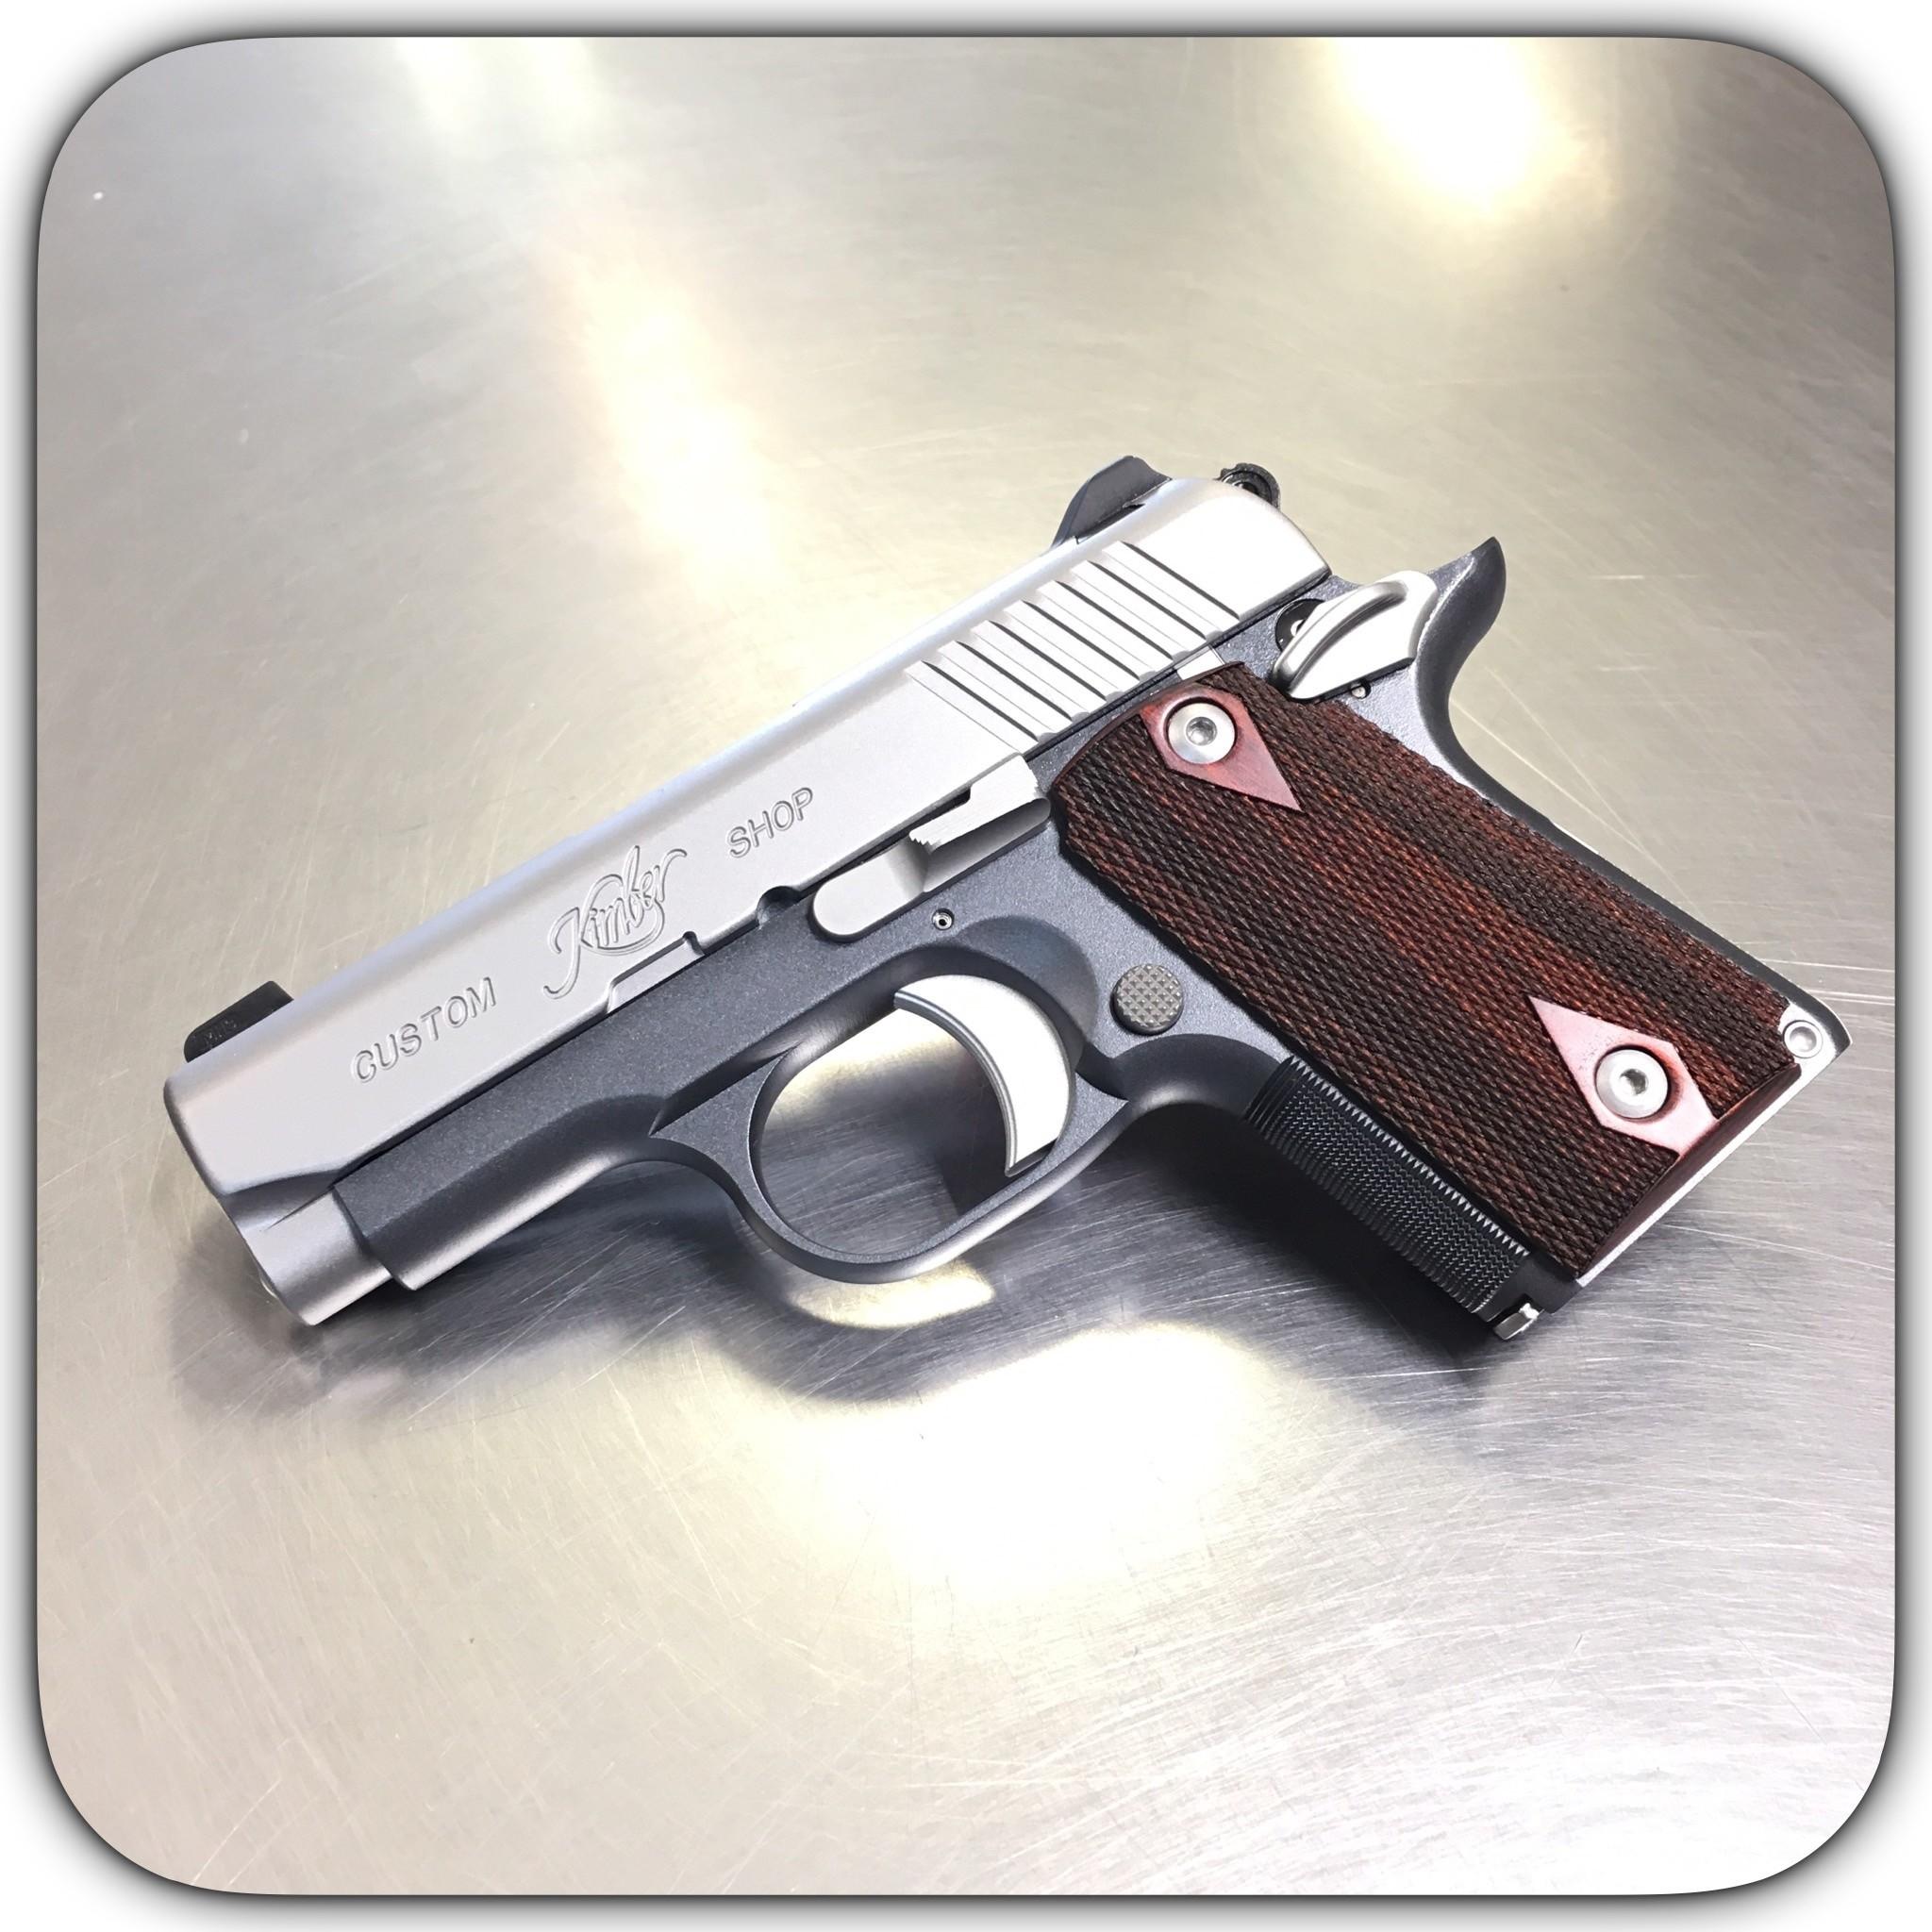 Kimber 1911 Micro Pistols: Kimber Micro 9 CDP Custom Shop 9mm Pistol 3300097